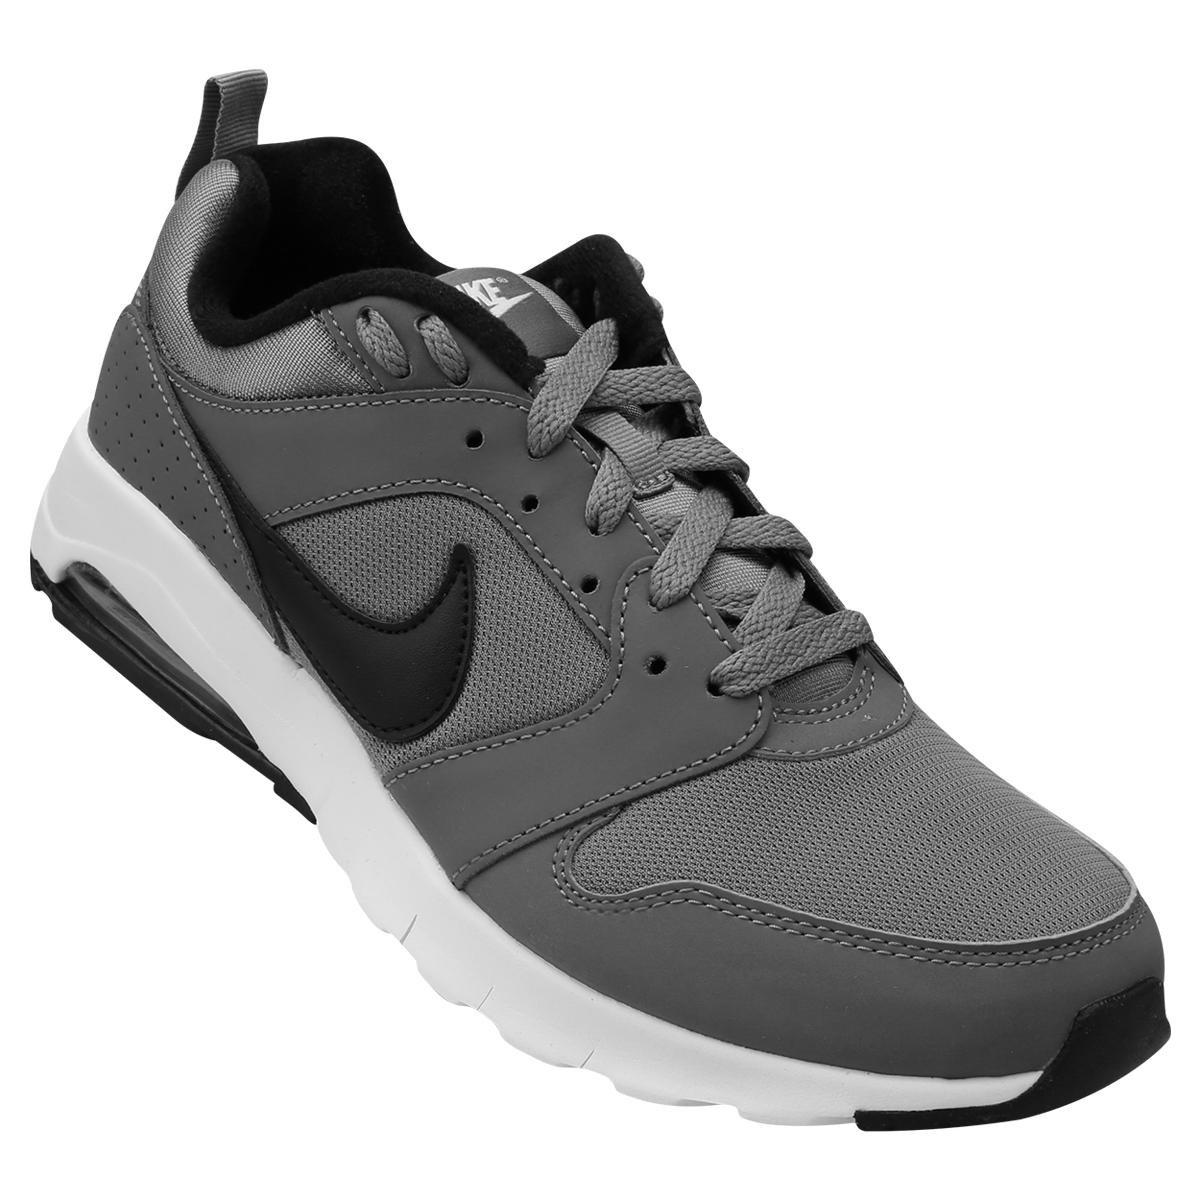 finest selection f592a 817dc Tênis Nike Air Max Motion Masculino - Compre Agora   Loja do Inter